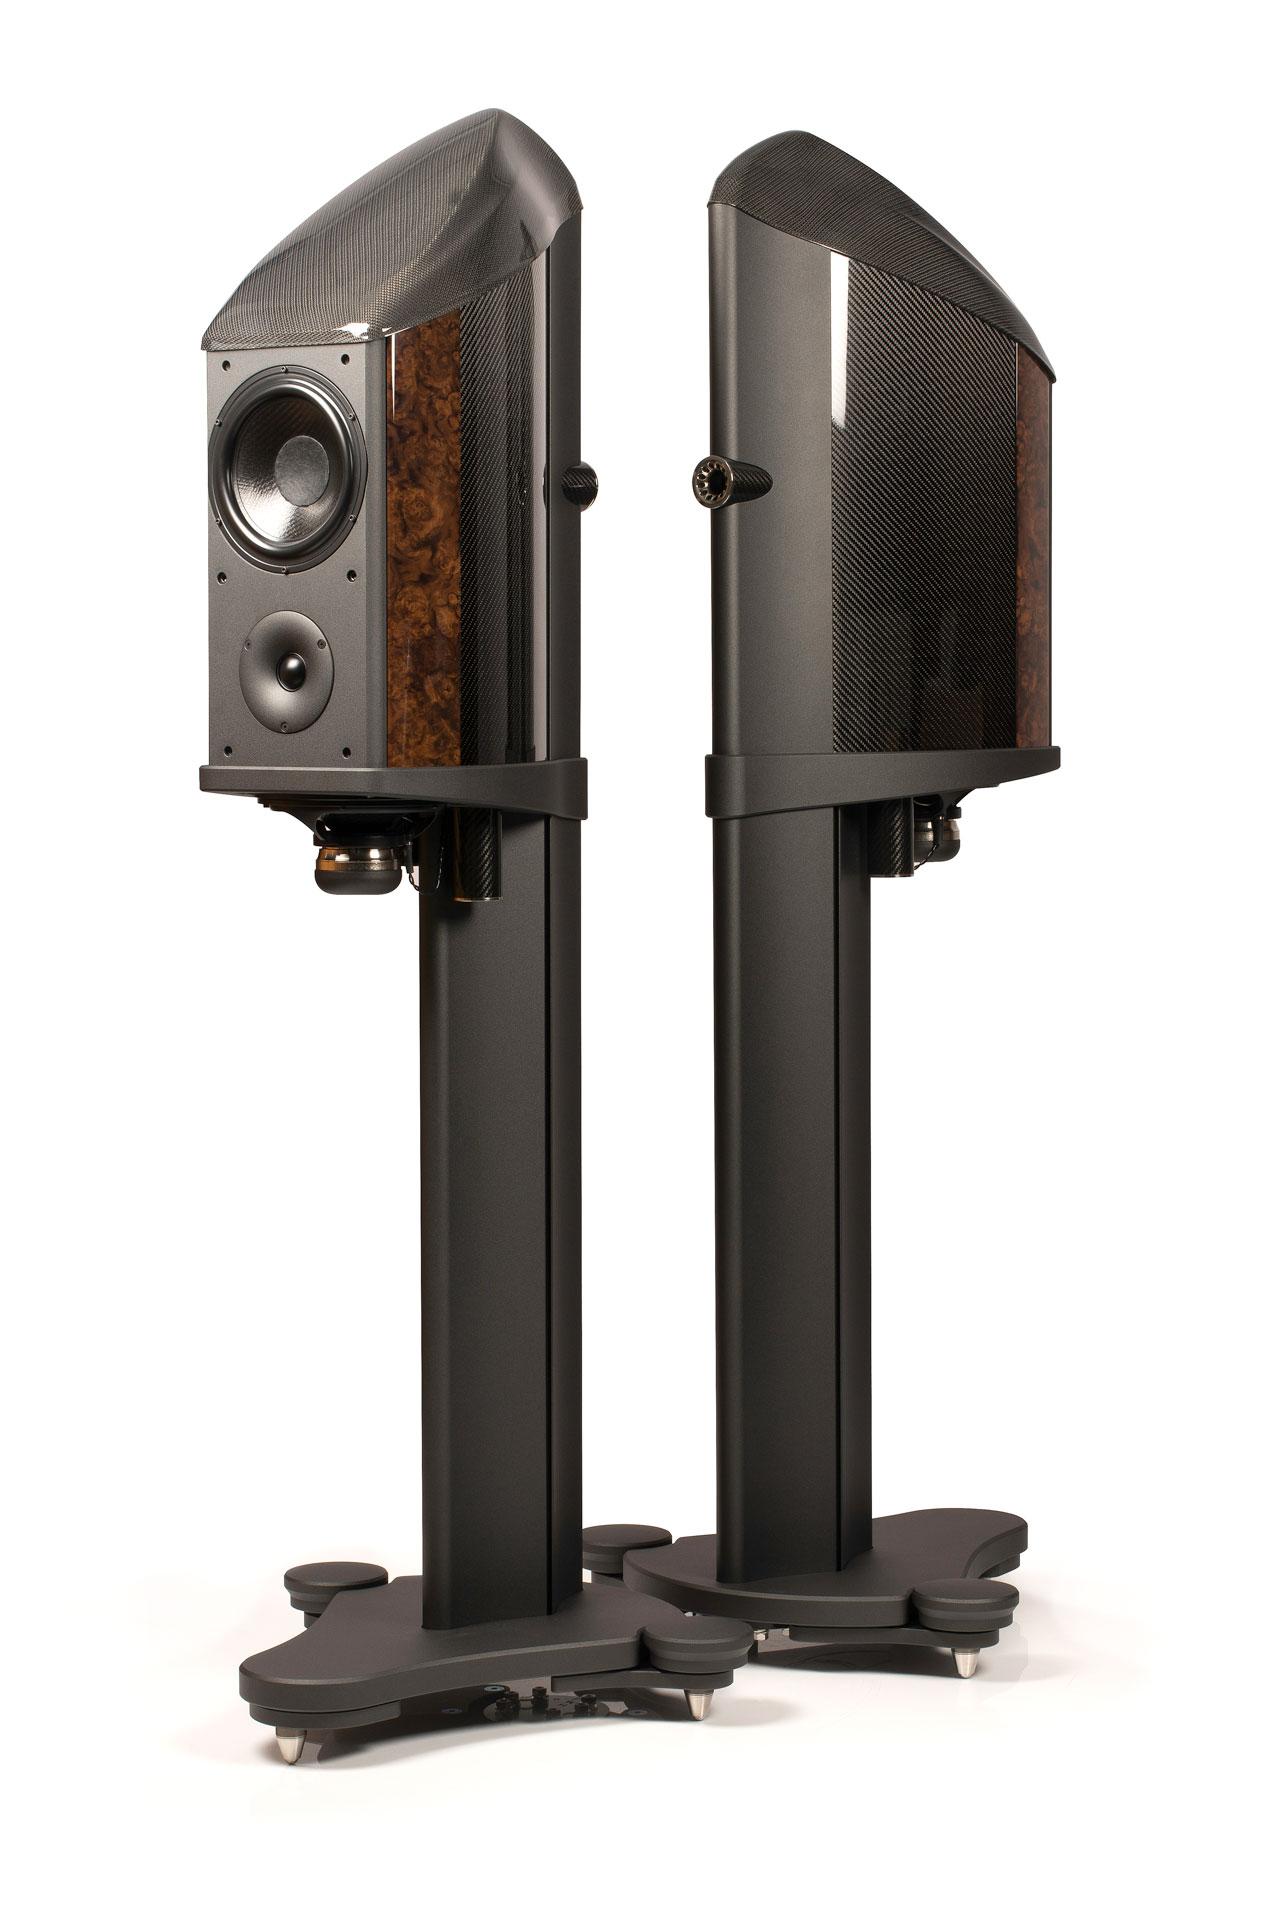 Wilson-Benesch-Geometry-Series-Endeavour-standmount-loudspeaker-singularity-audio-1